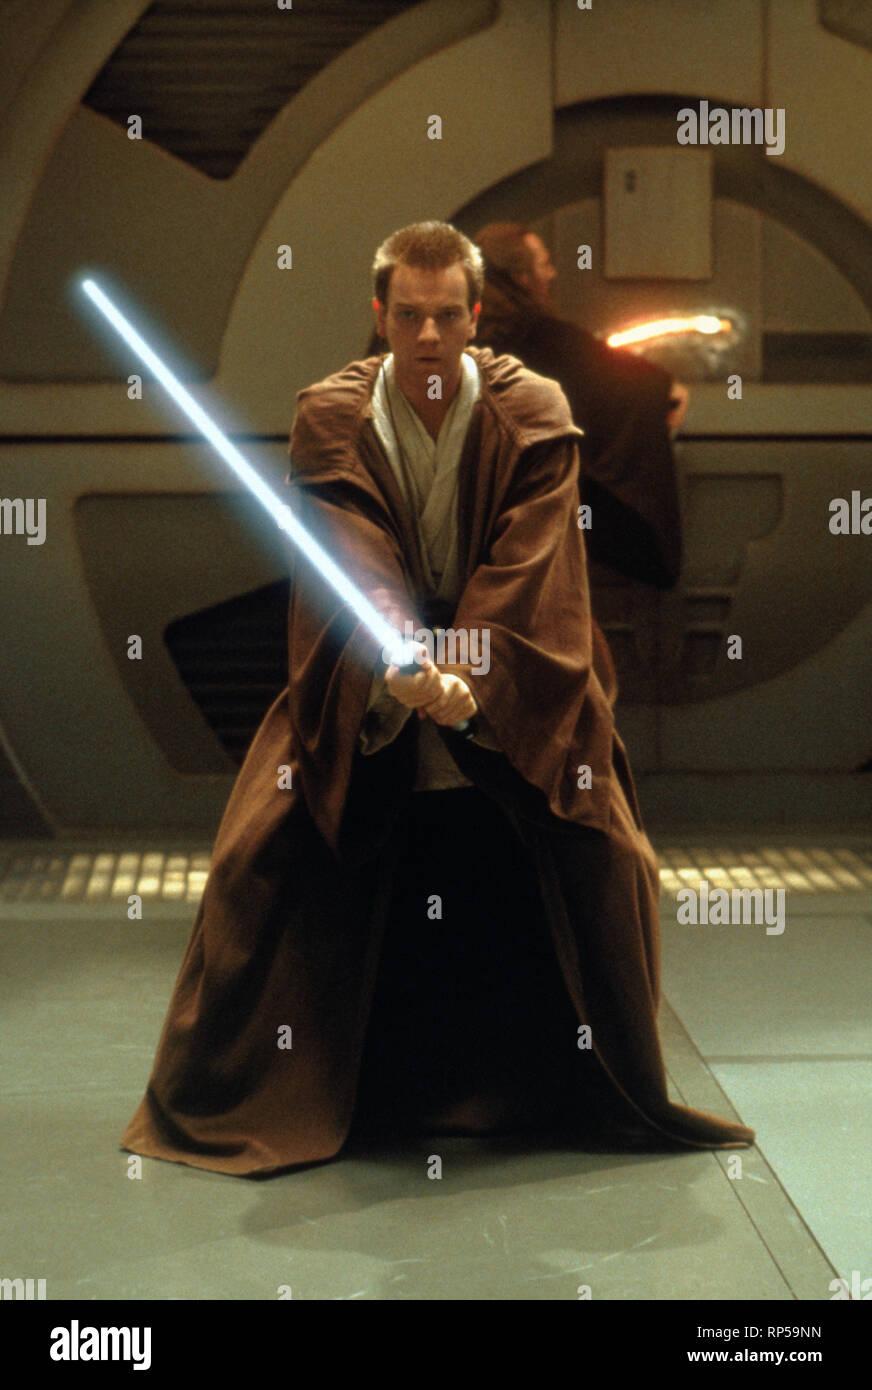 Ewan Mcgregor Star Wars Episode I The Phantom Menace 1999 Stock Photo Alamy